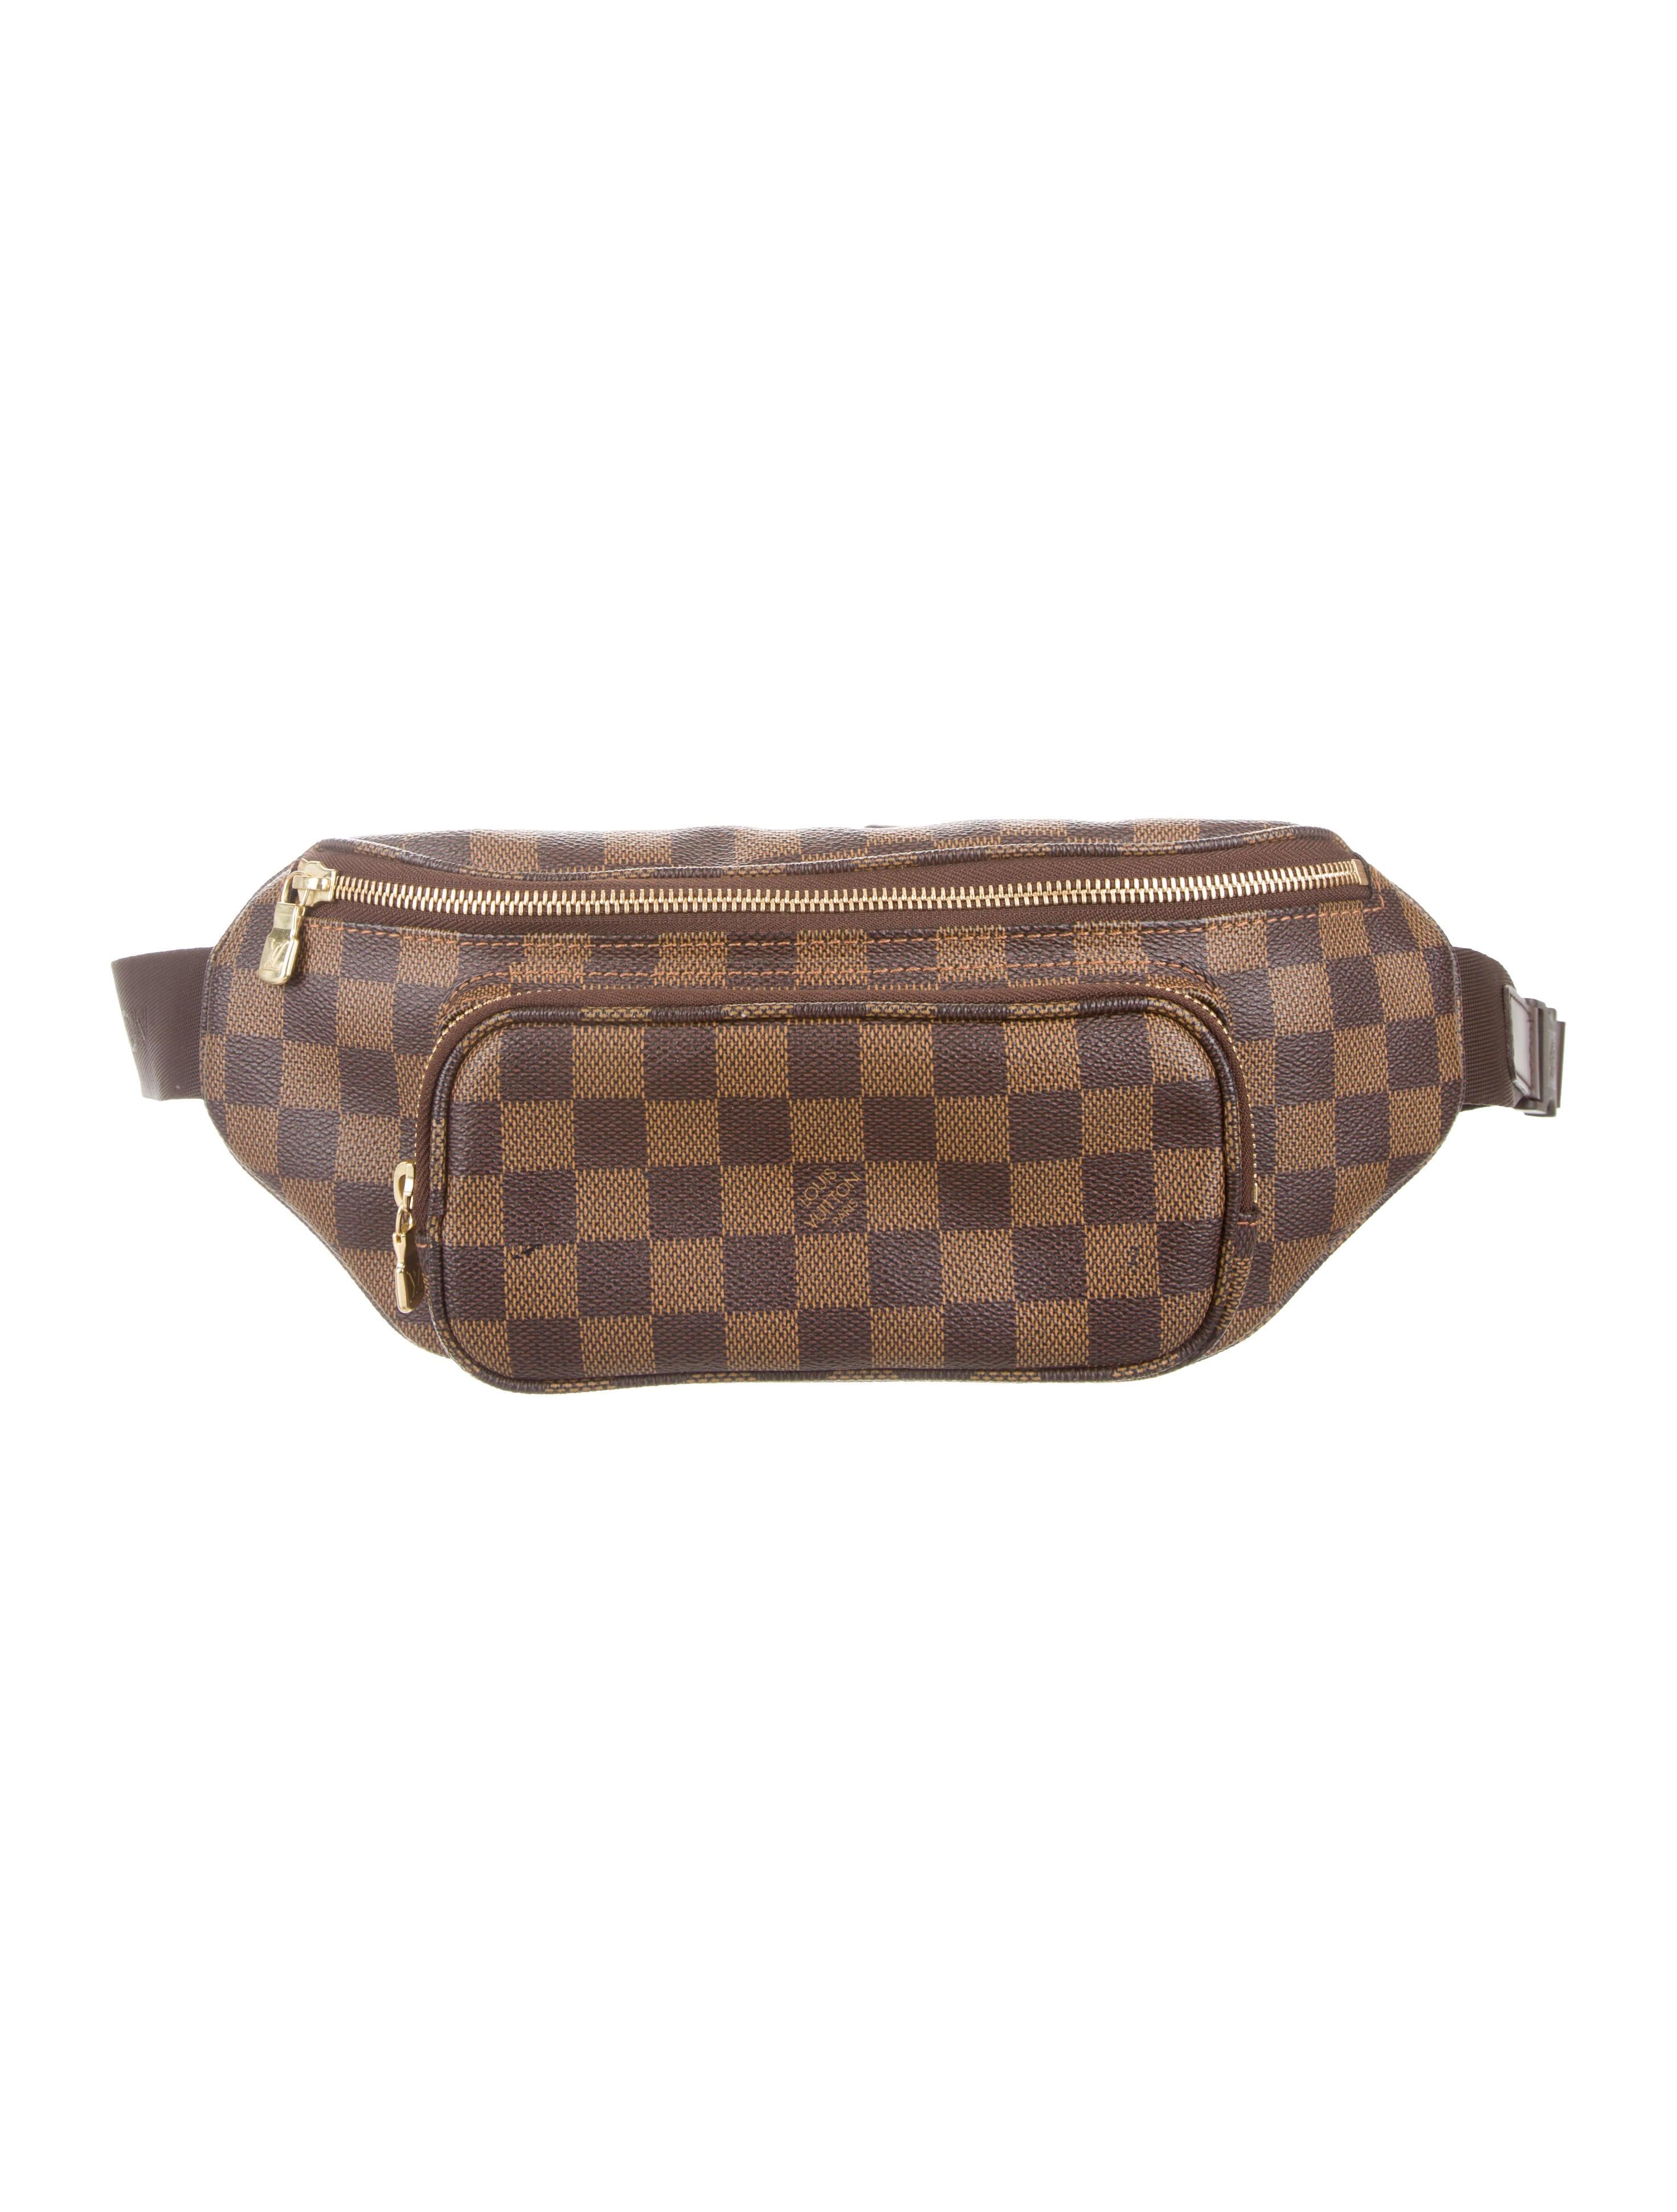 791414031ab0 Louis Vuitton Damier Ebene Melville Waist Bag - Bags - LOU63942 ...